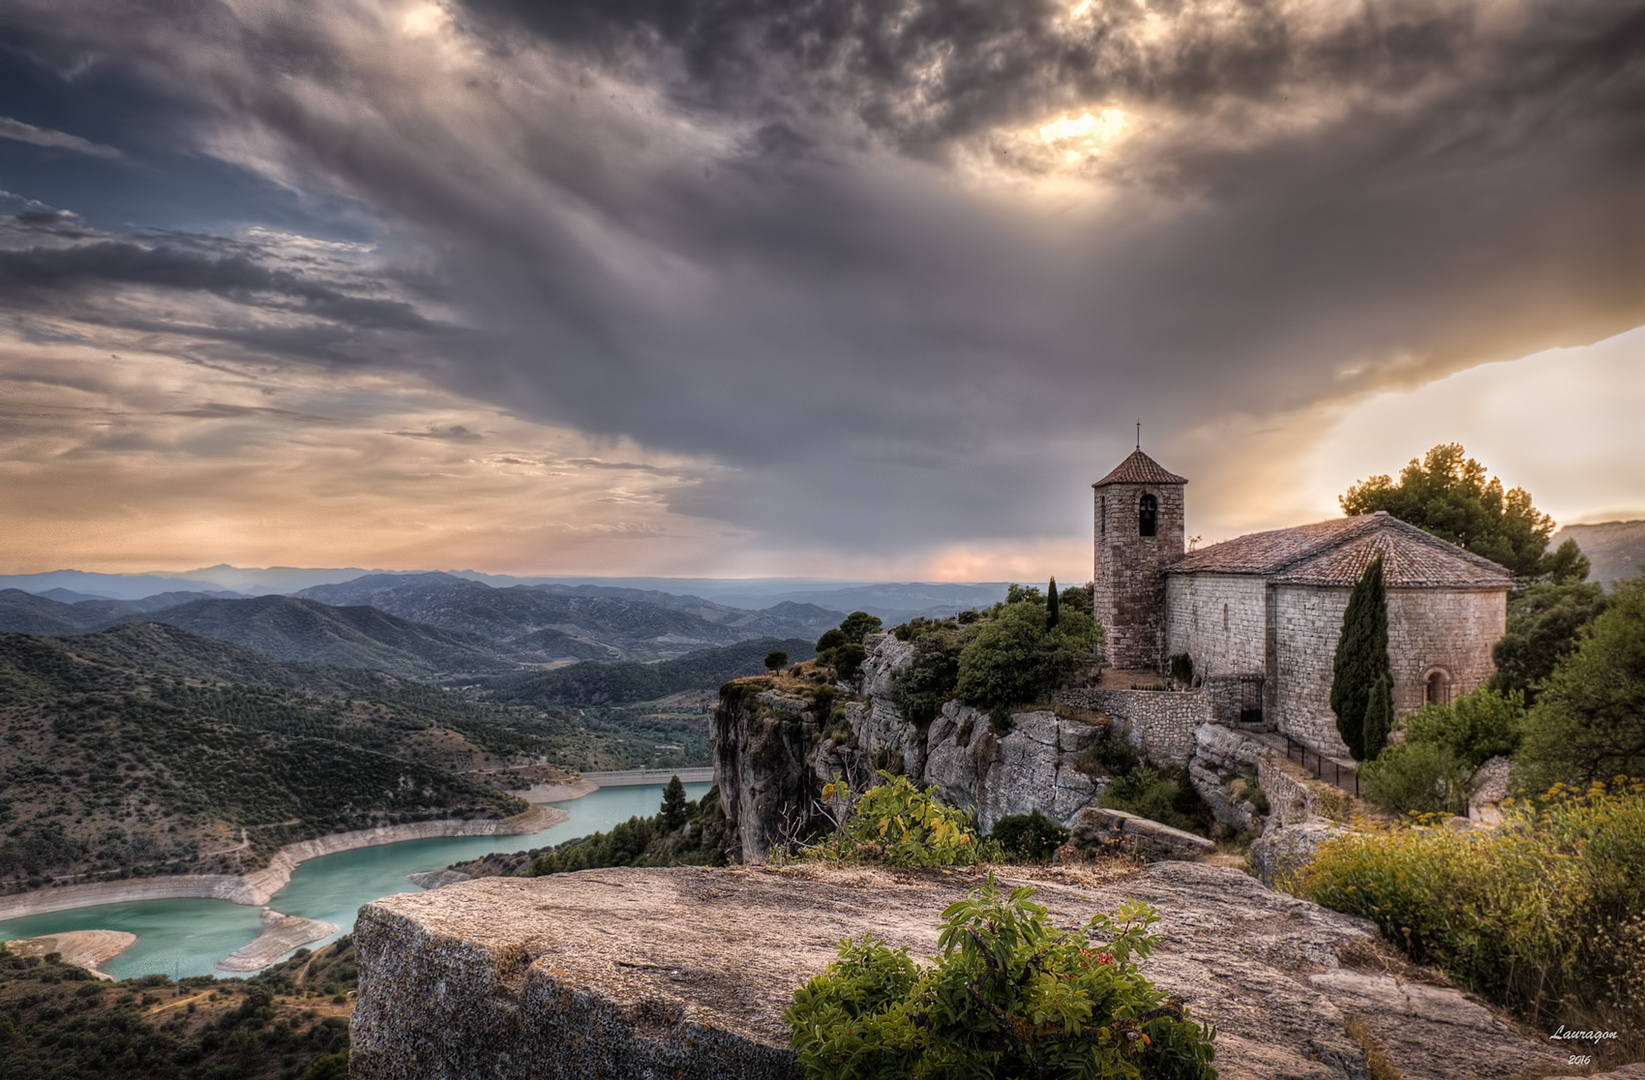 Siurana (Tarragona)